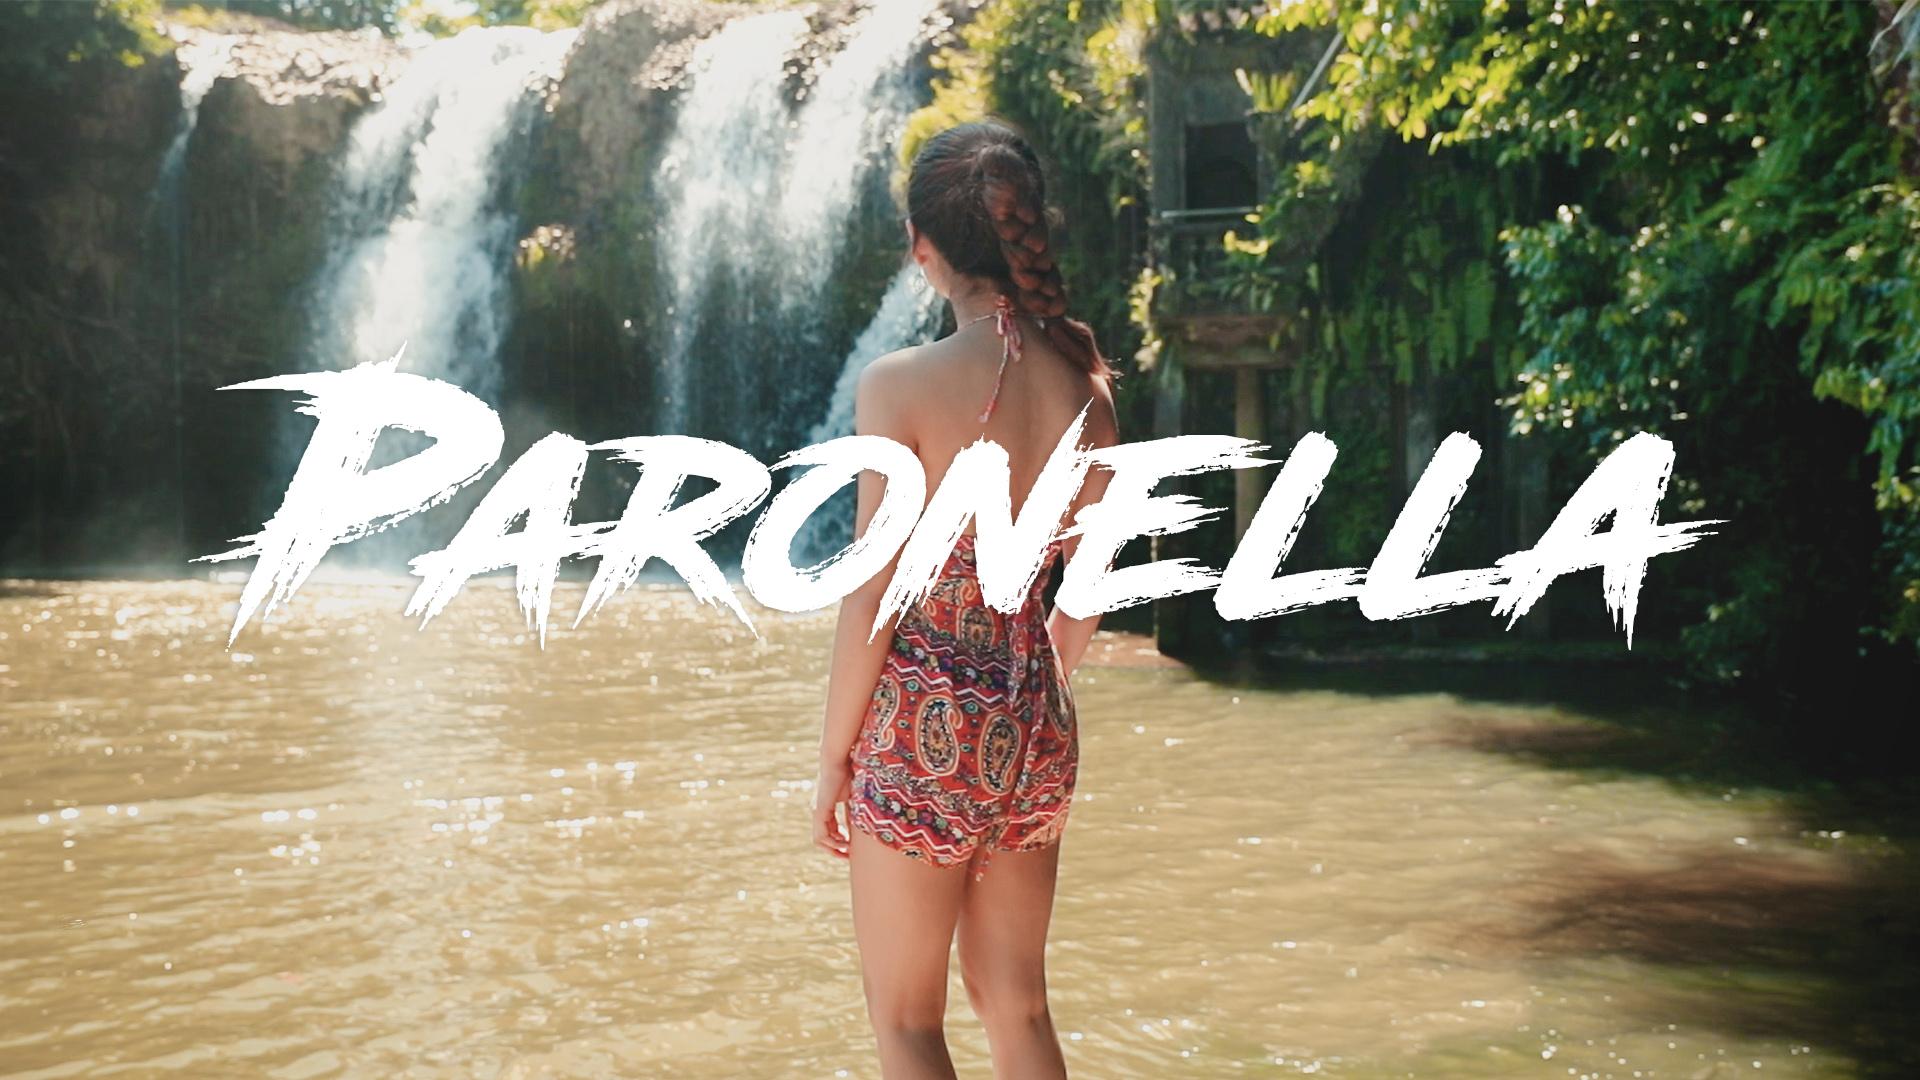 Paronella Thumbnail (No Boarder).jpg